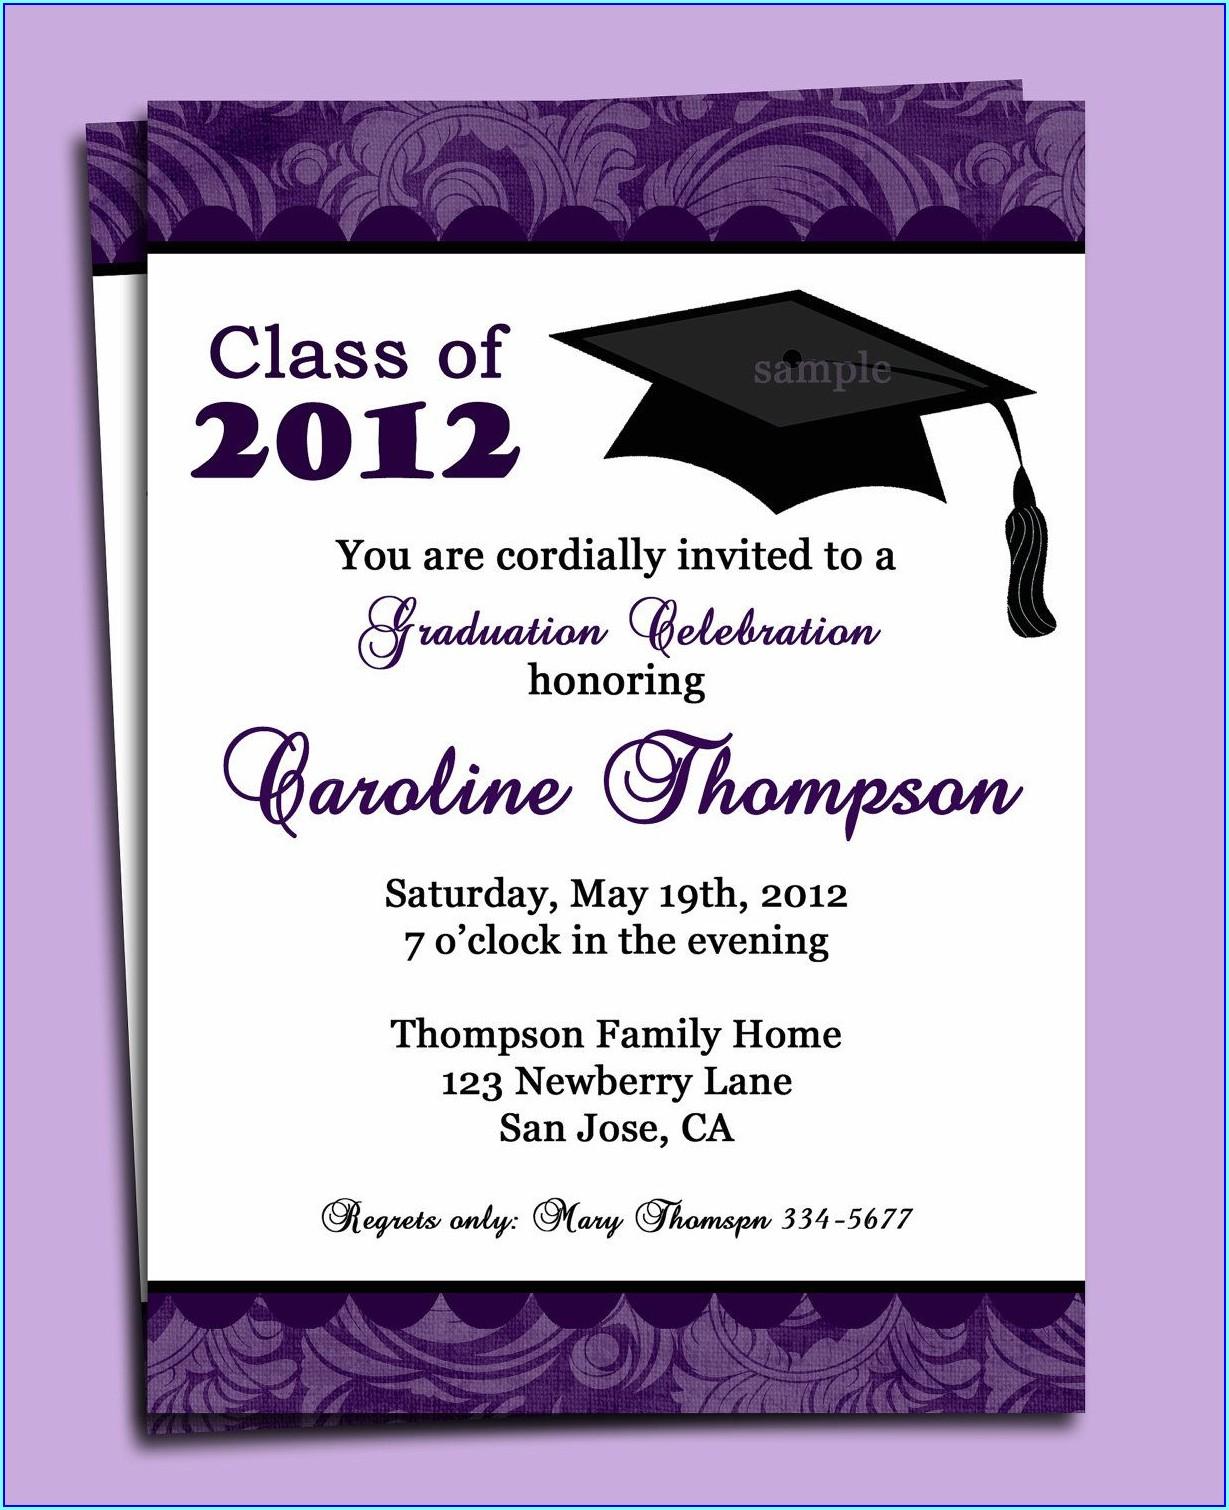 Graduation Ceremony Invitation Card Design